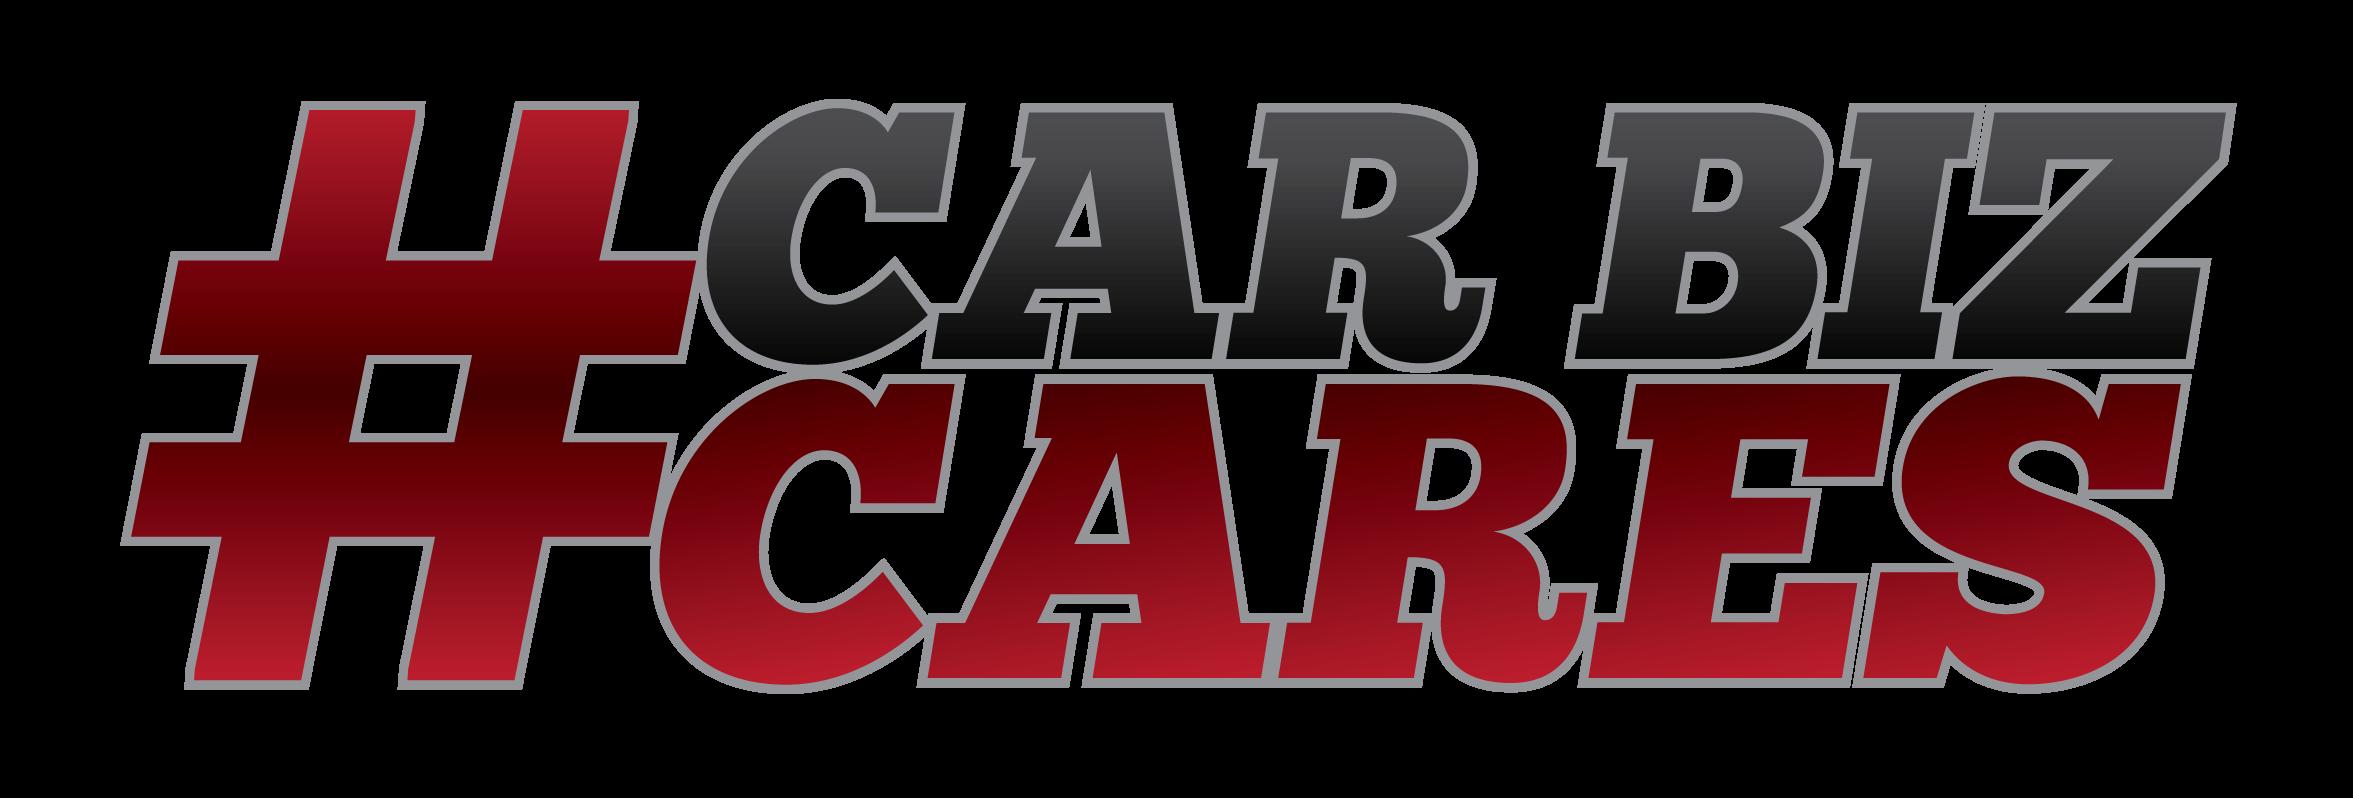 Car-Biz-Cares---Logo-Design-Hashtag2